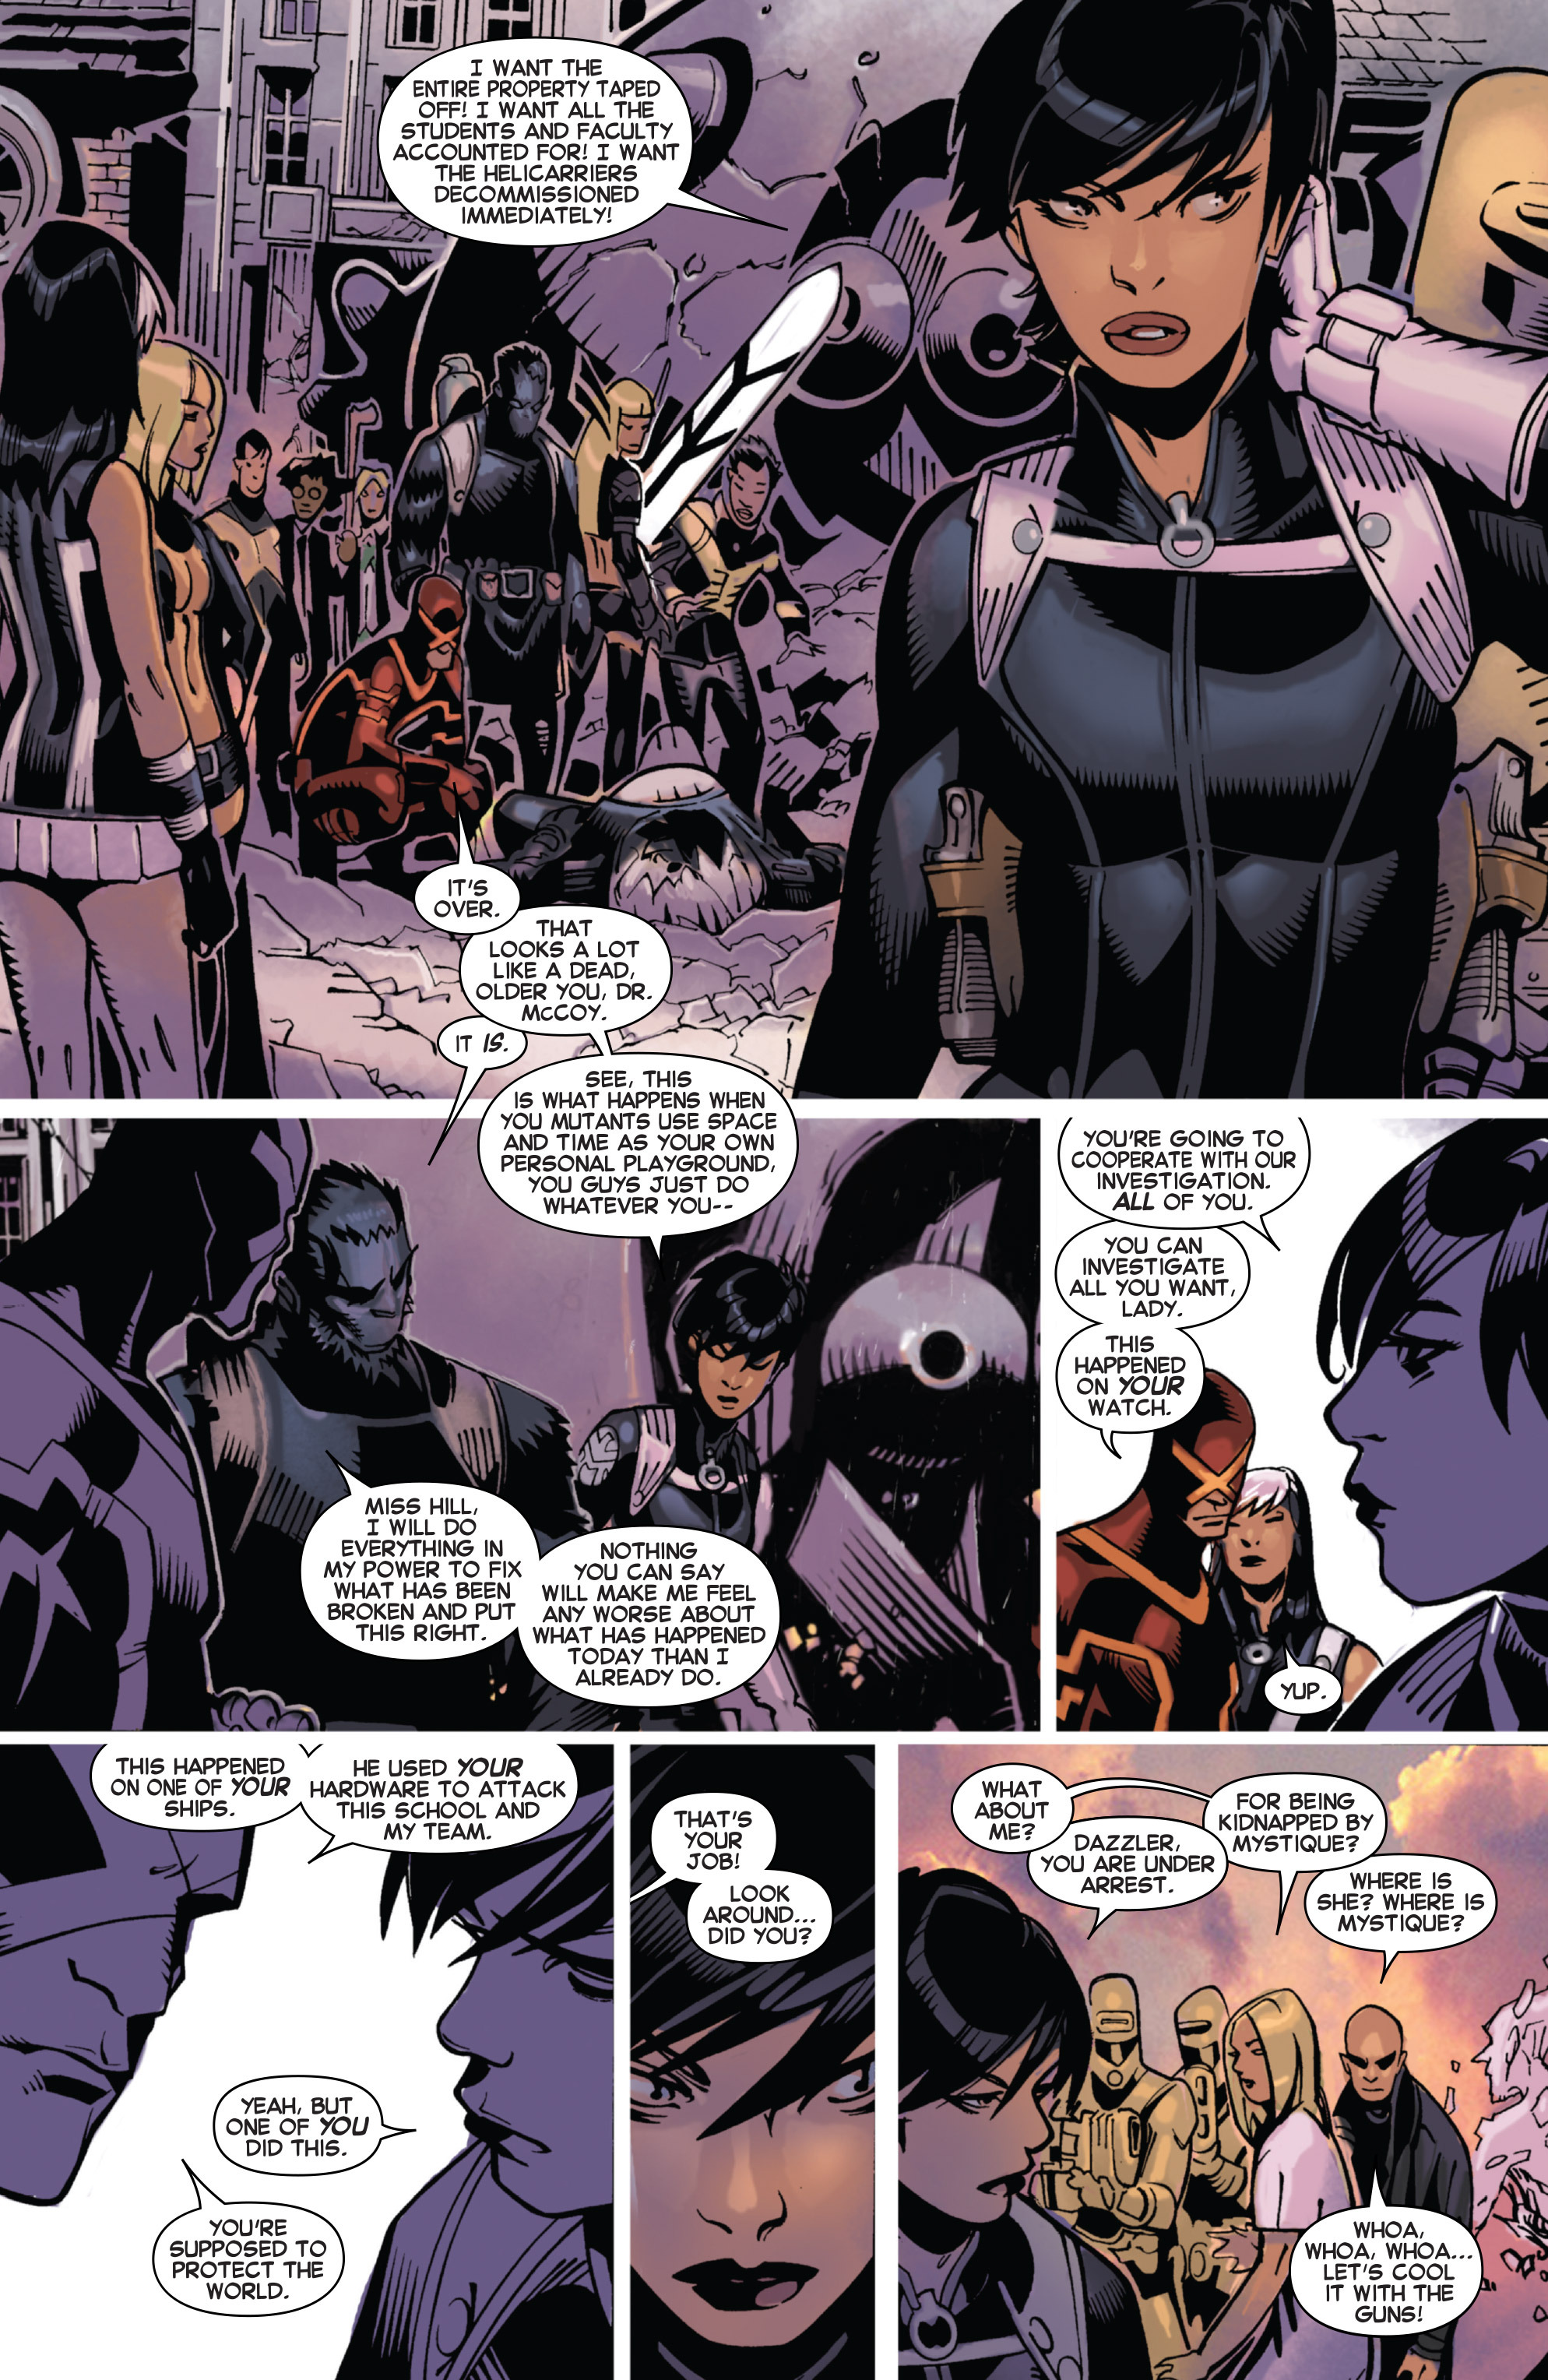 Read online Uncanny X-Men (2013) comic -  Issue # _TPB 4 - vs. S.H.I.E.L.D - 77